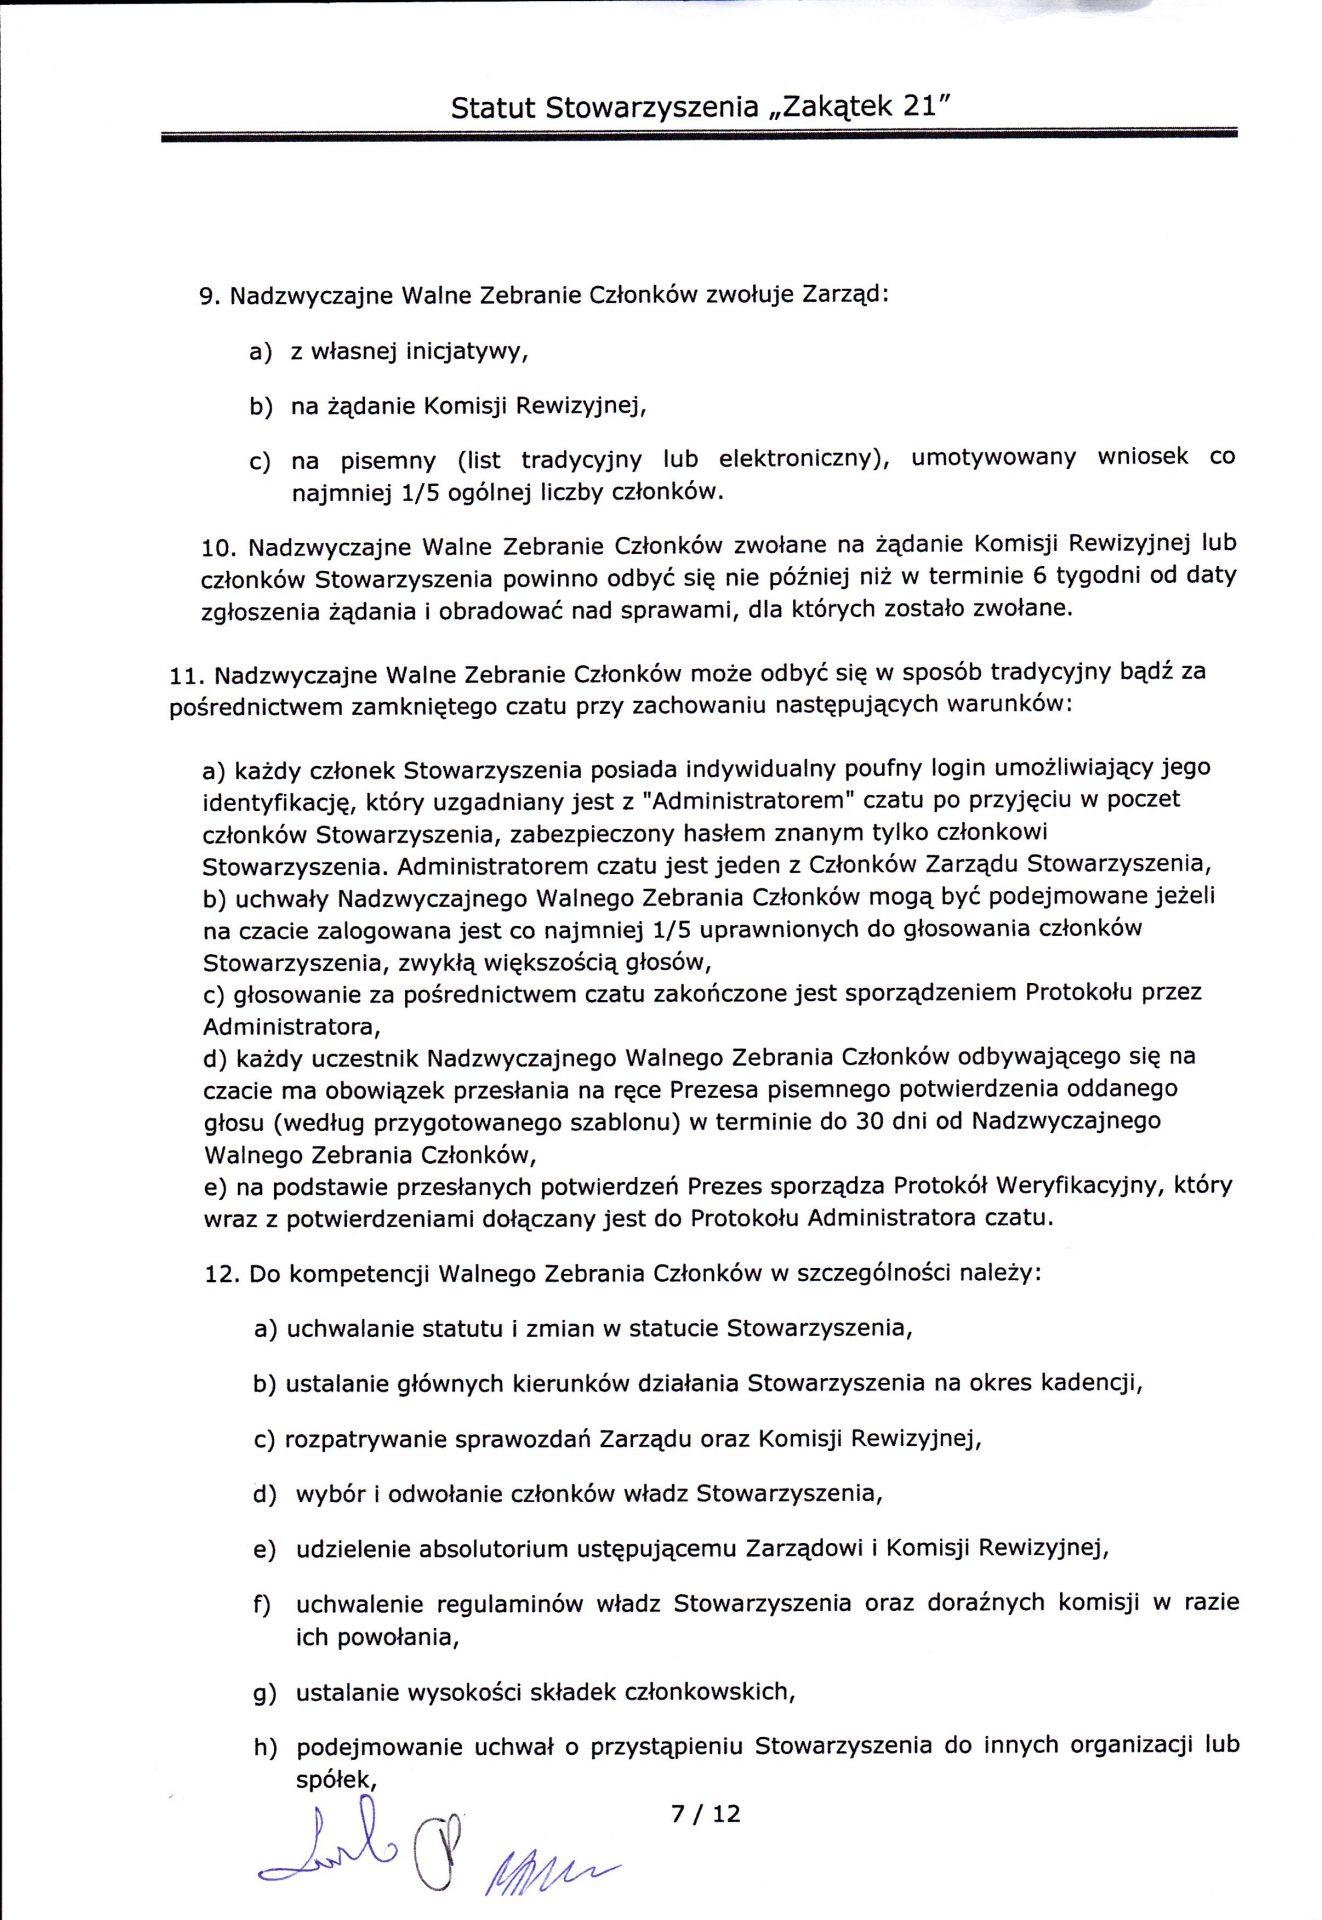 strona siódma statutu